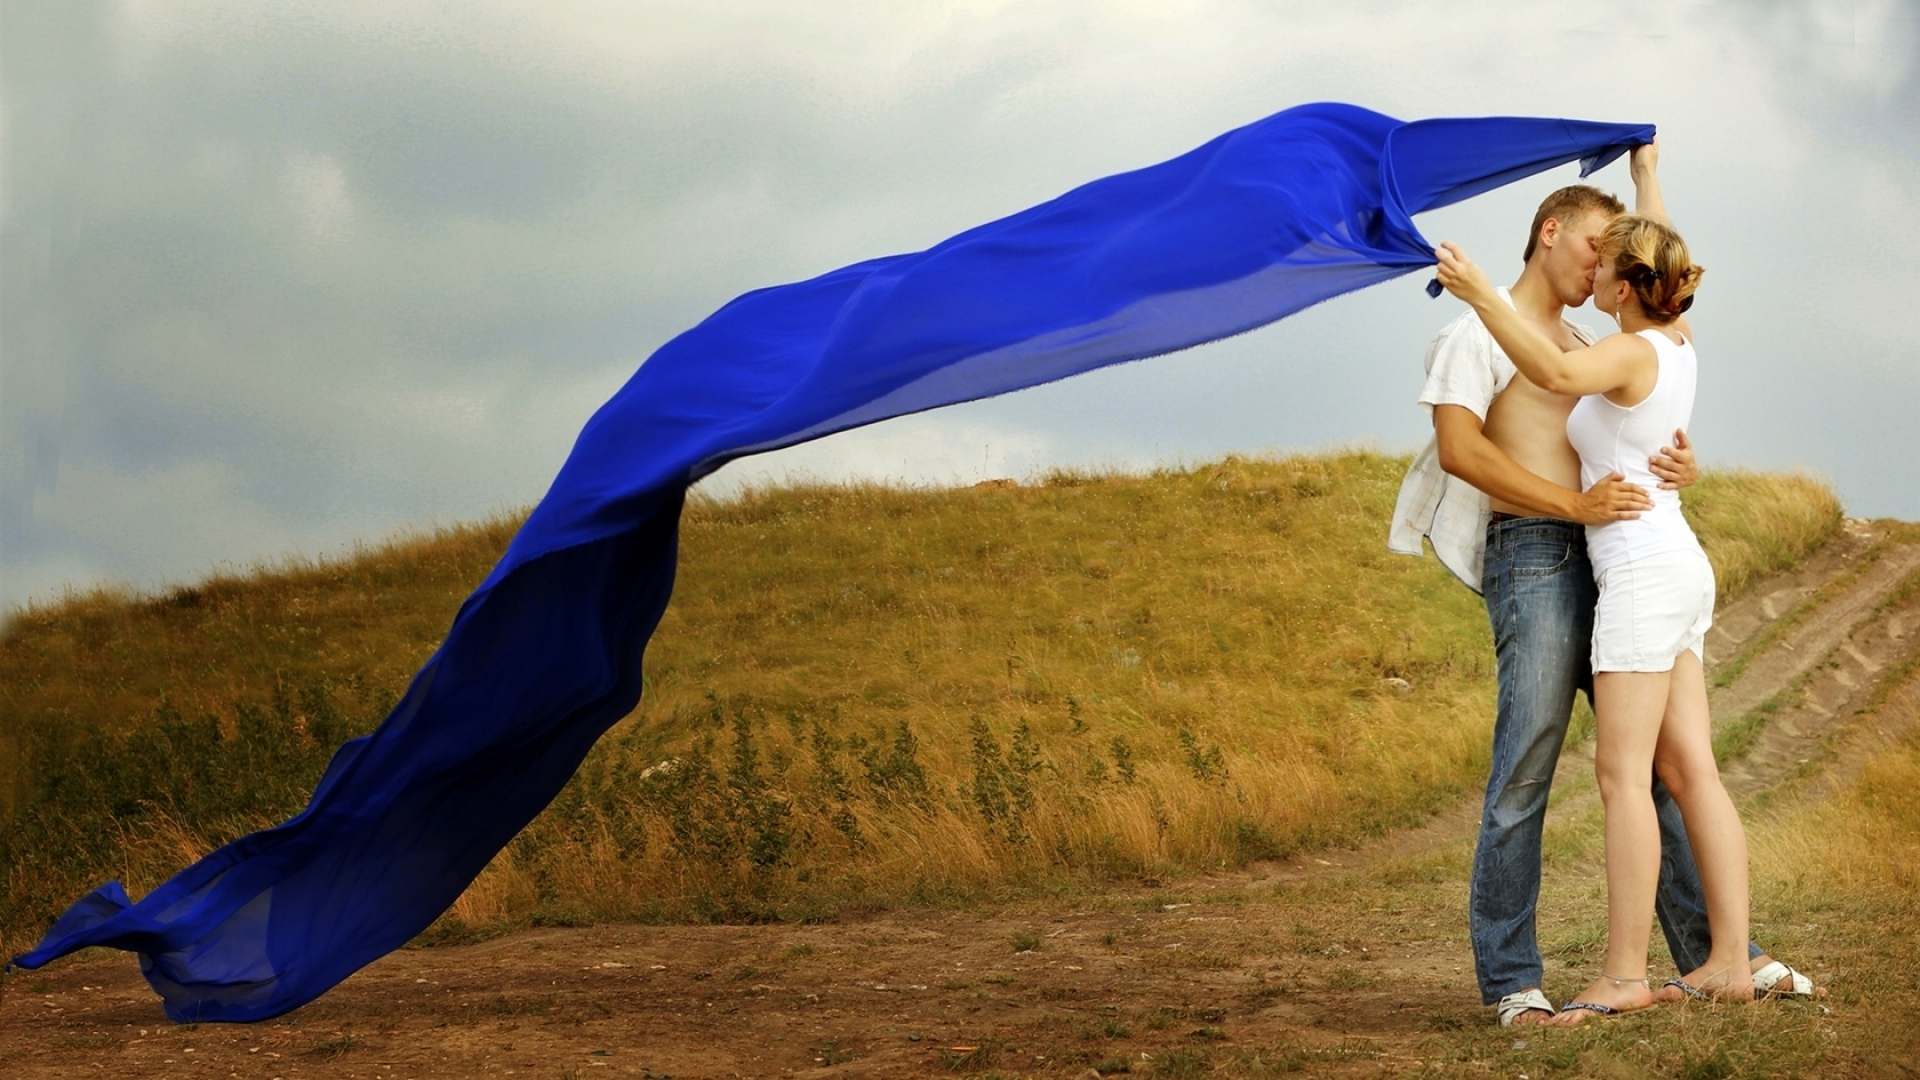 Good Wallpaper Love Boyfriend - boyfriend_girlfriend_hug_kiss_love_fields_meadows_grass_roads_trails_fabric_blue_shawl_sky_overcast_54150_1920x1080  Image_30991.jpg